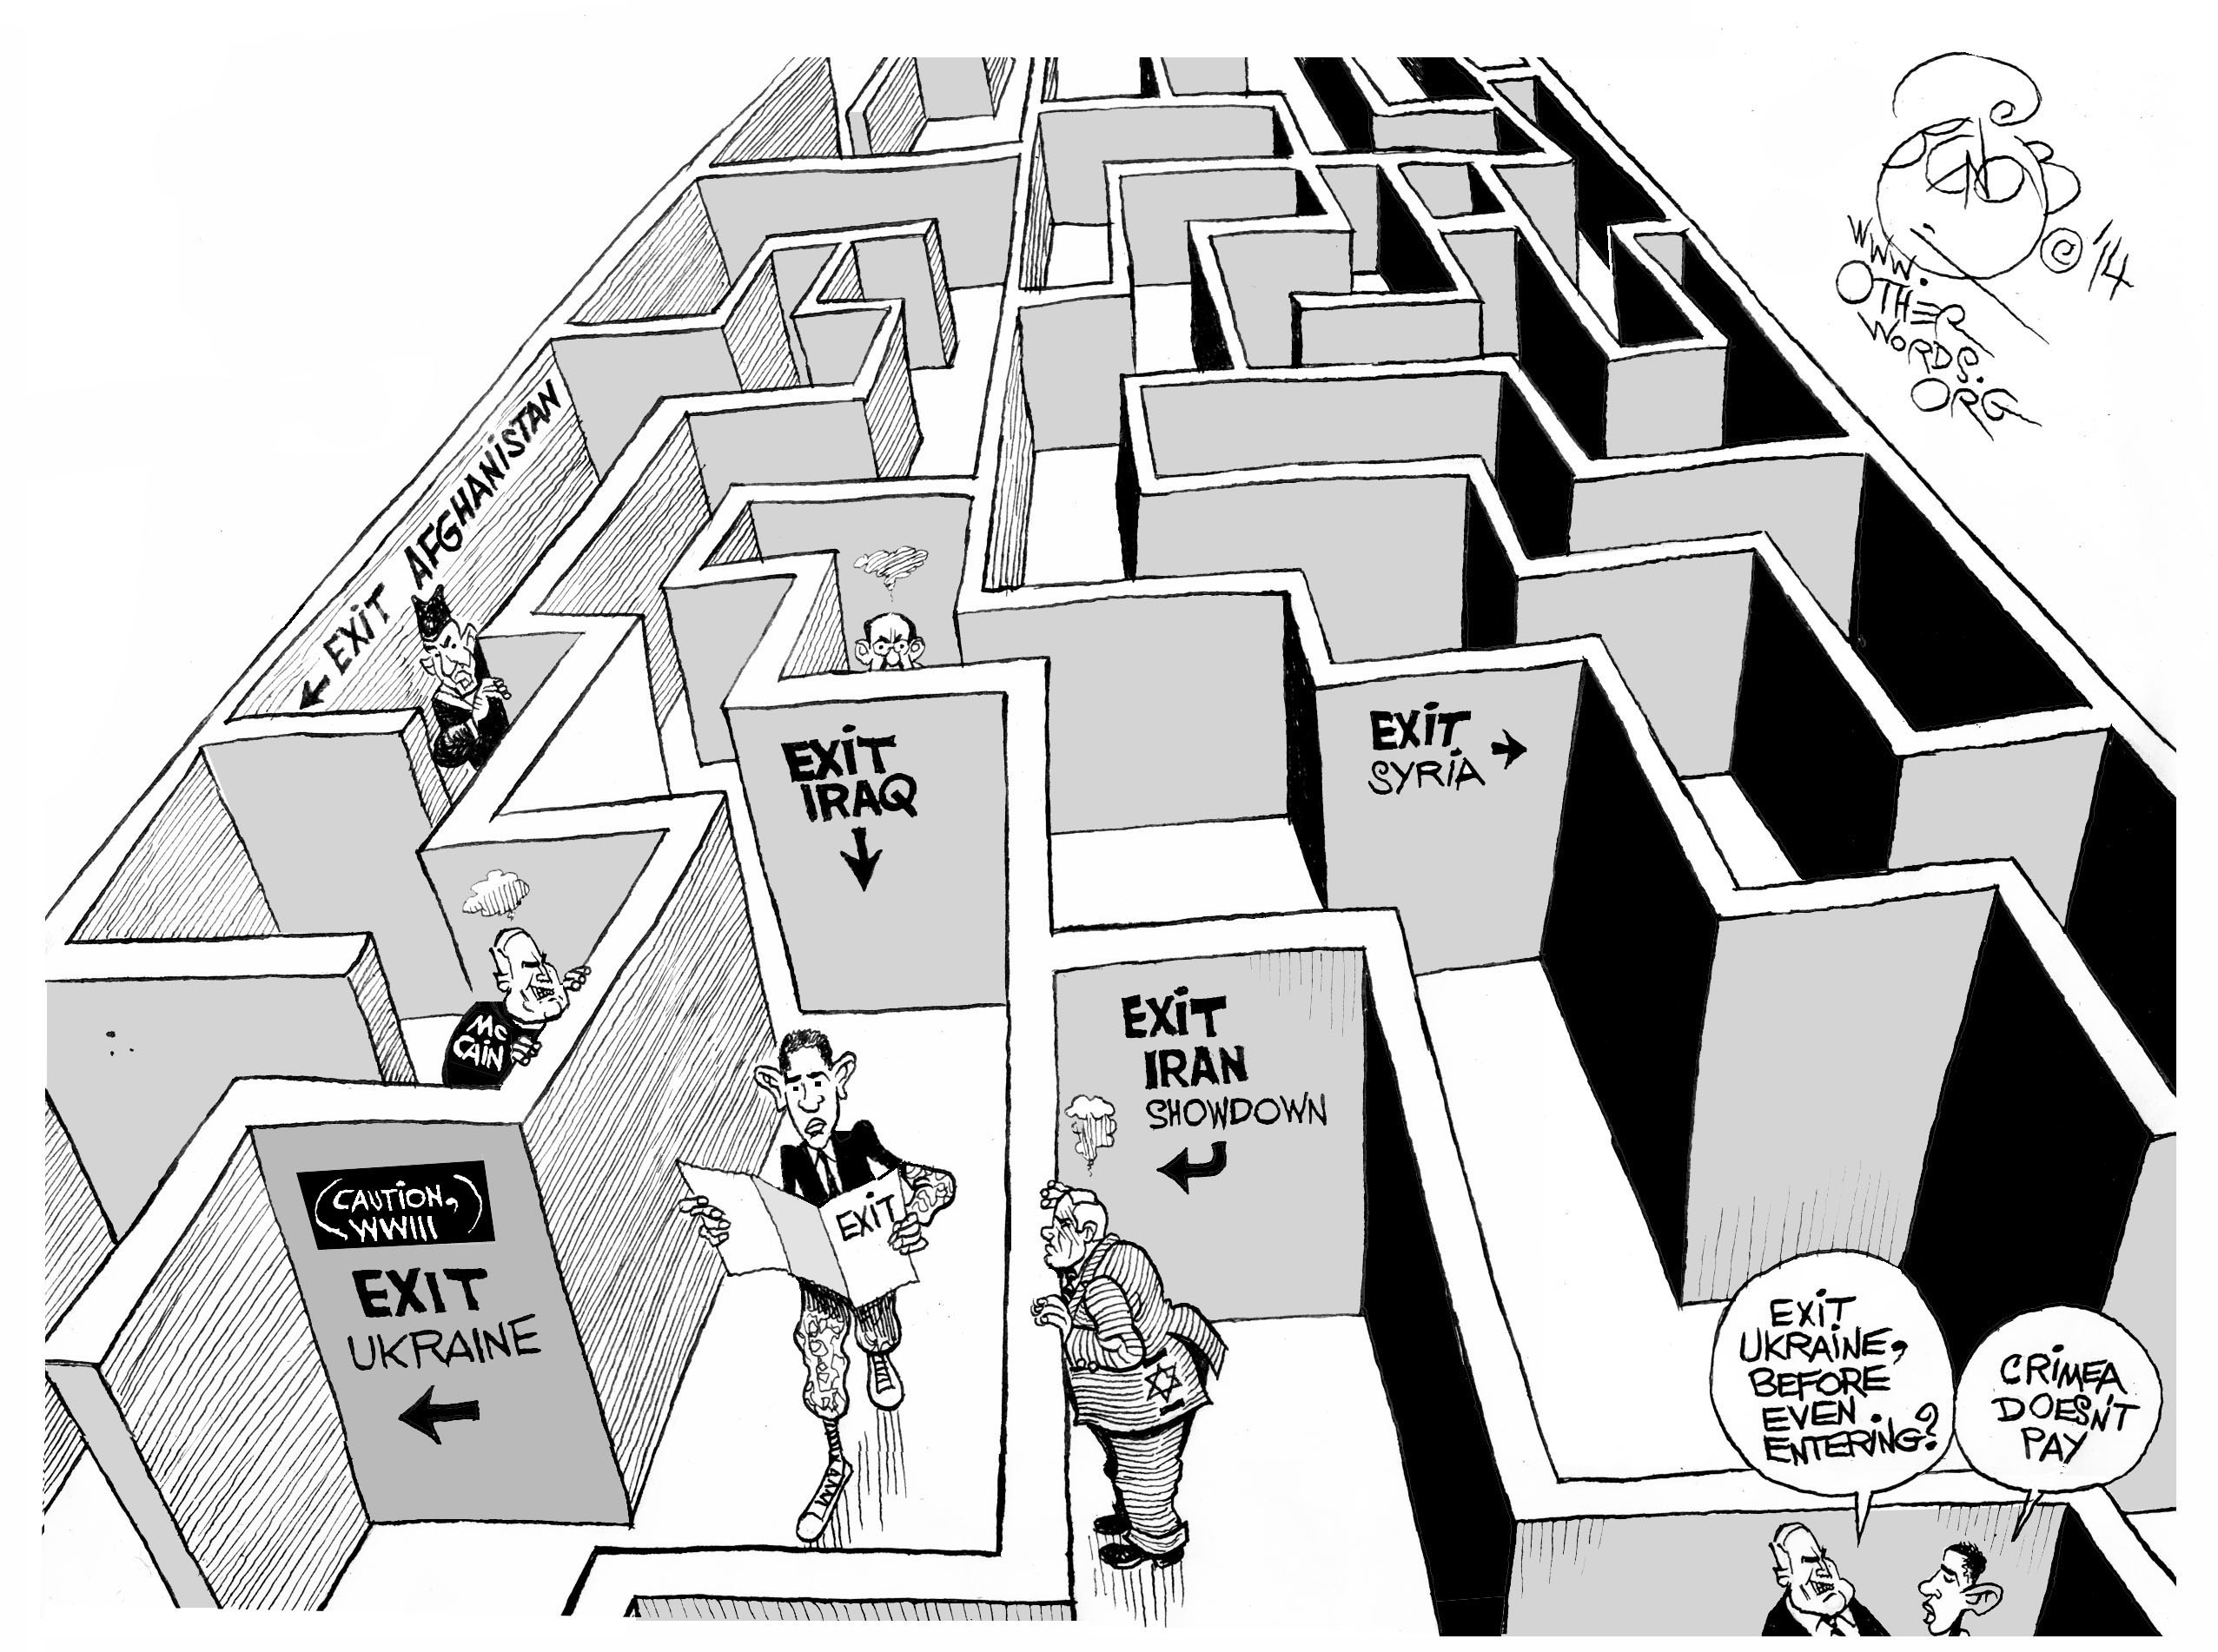 https://i1.wp.com/otherwords.org/wp-content/uploads/2014/03/obama-no-exit-military-strategy-cartoon.jpg